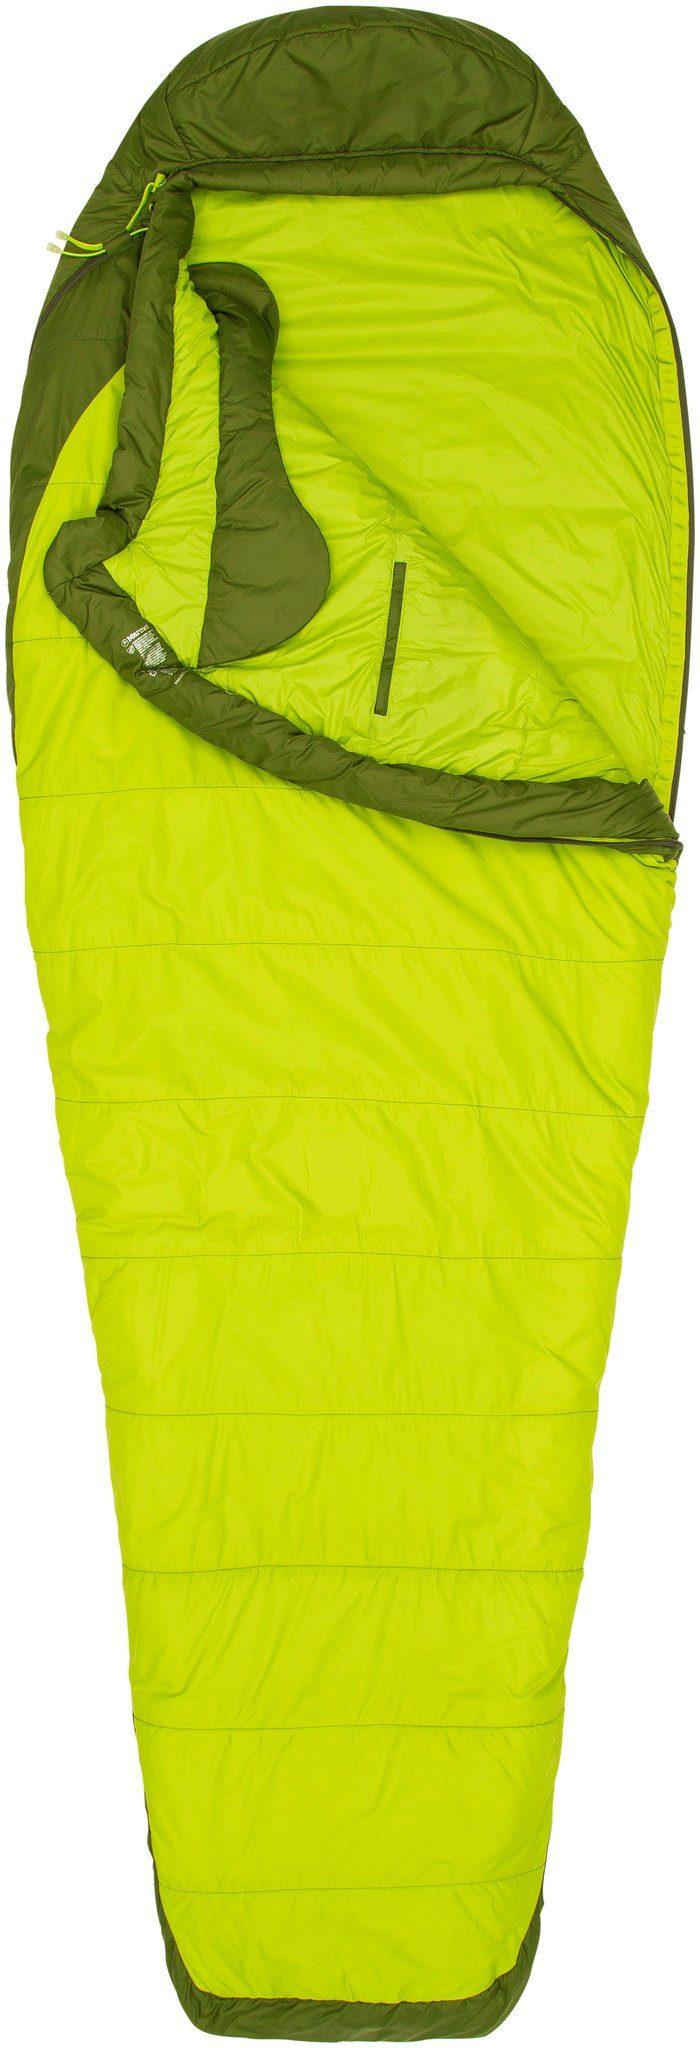 Marmot Schlafsack »Trestles Elite 30 Sleeping Bag Regular«